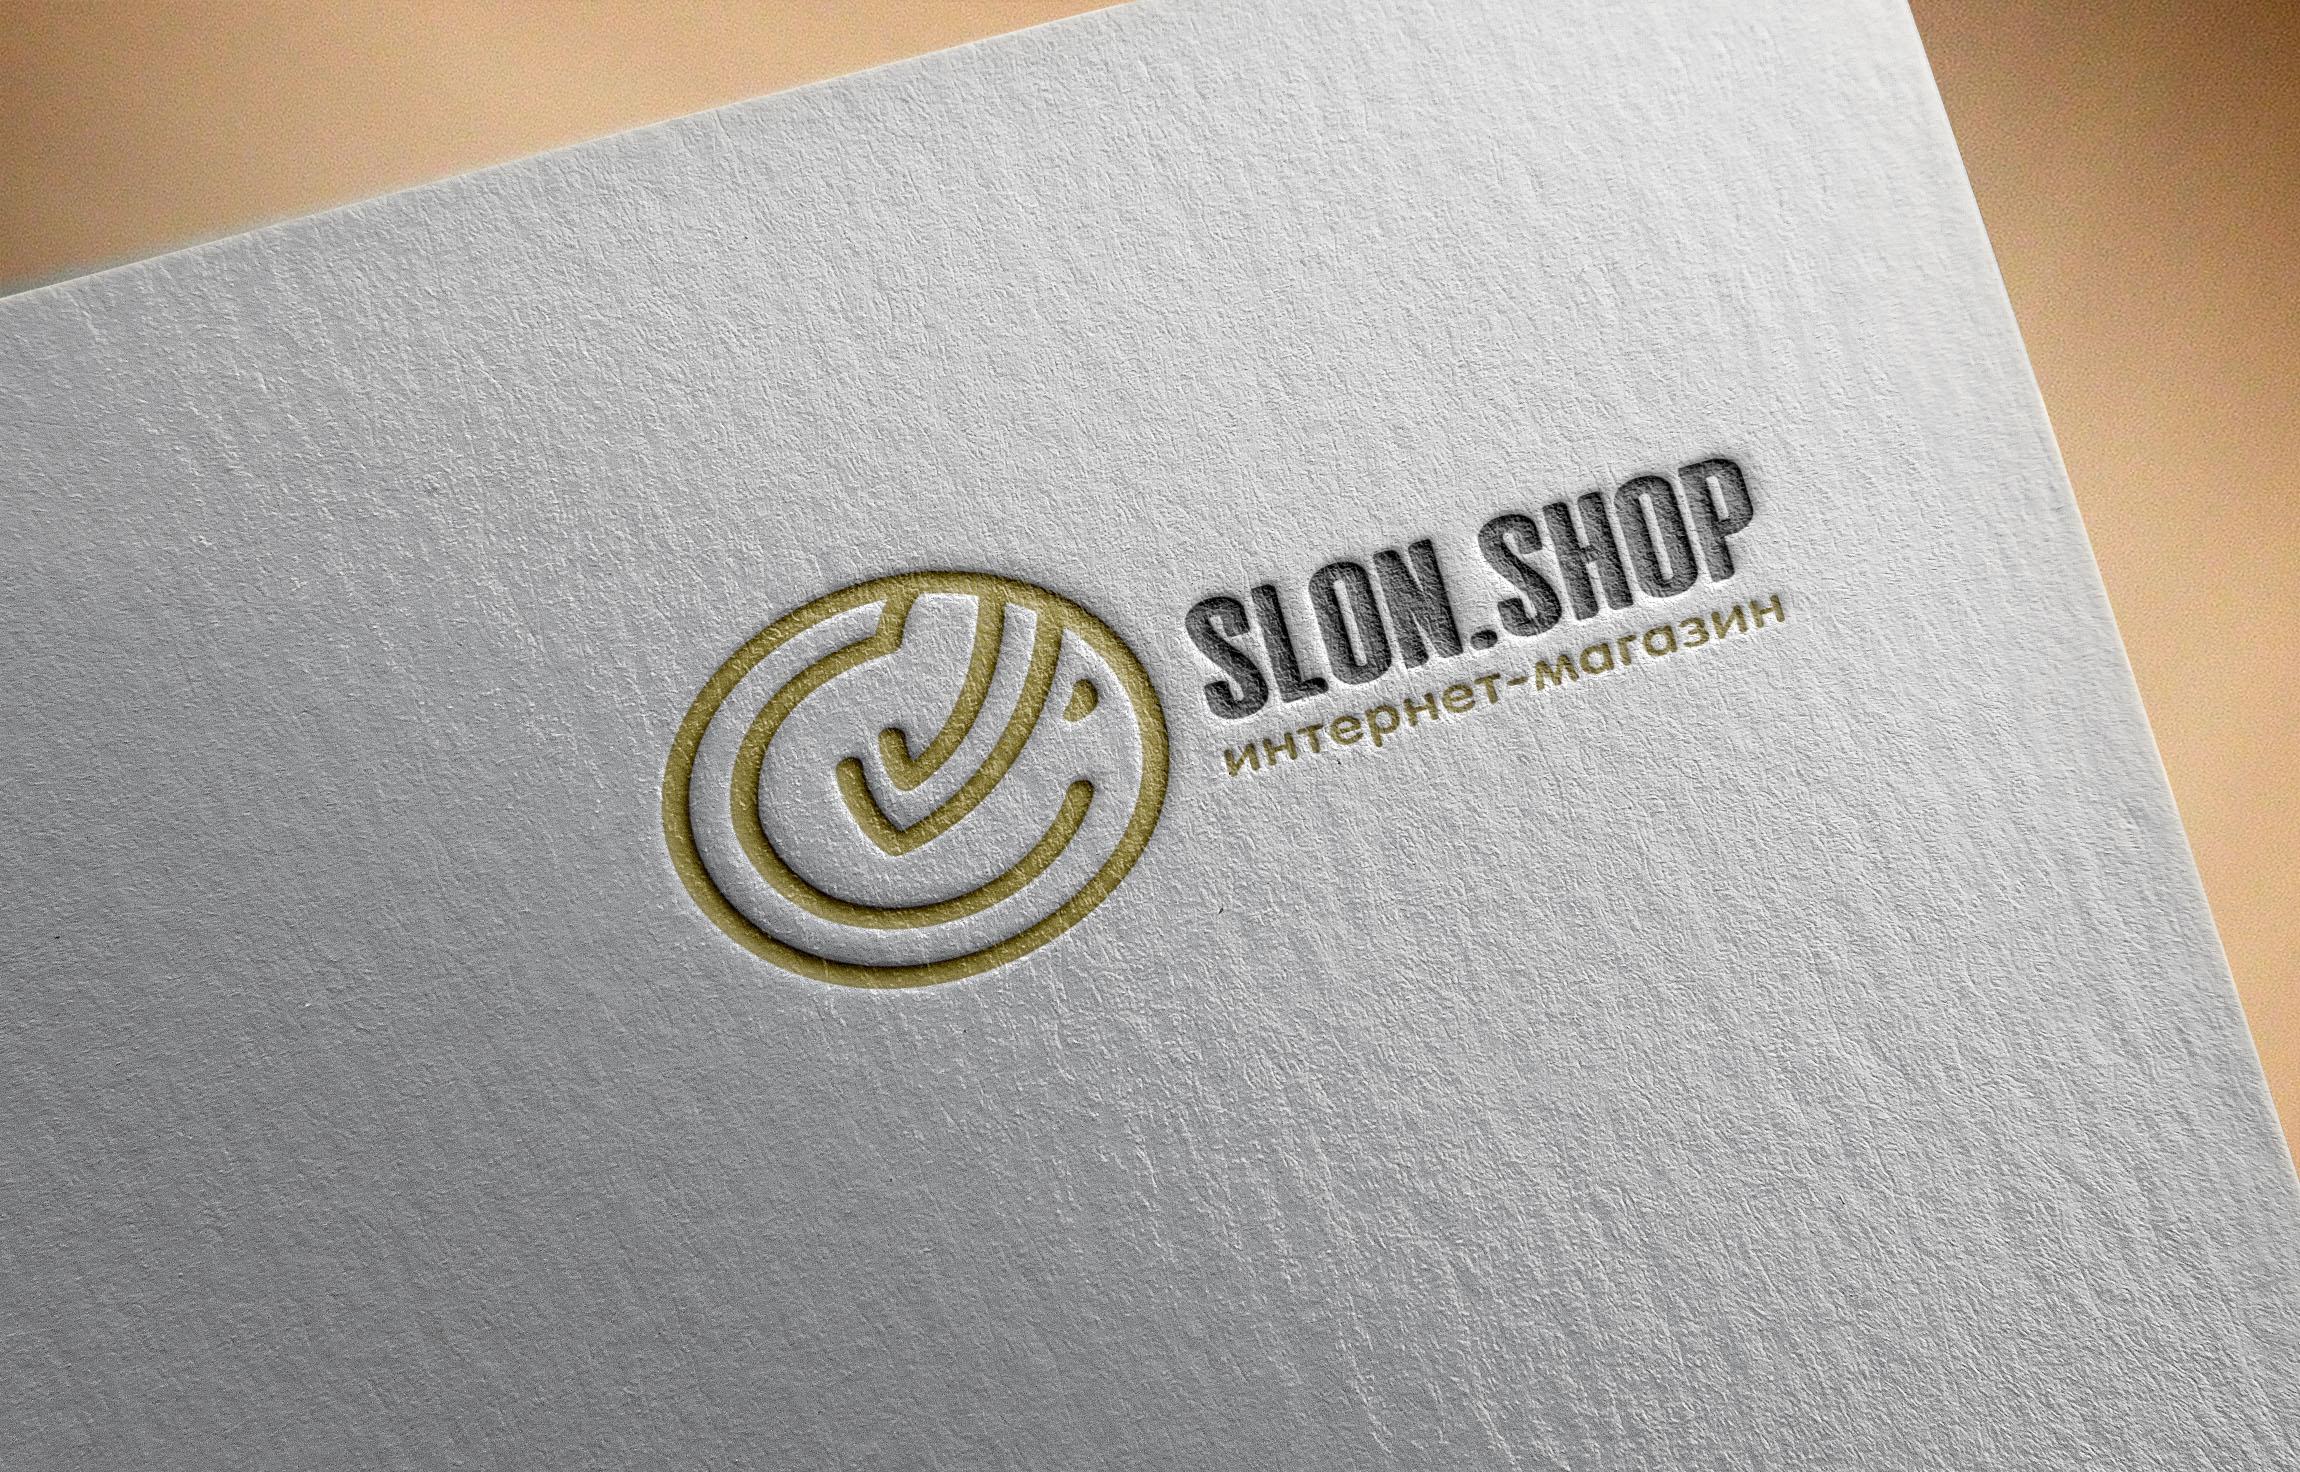 Разработать логотип и фирменный стиль интернет-магазина  фото f_1235991ae60e896e.jpg